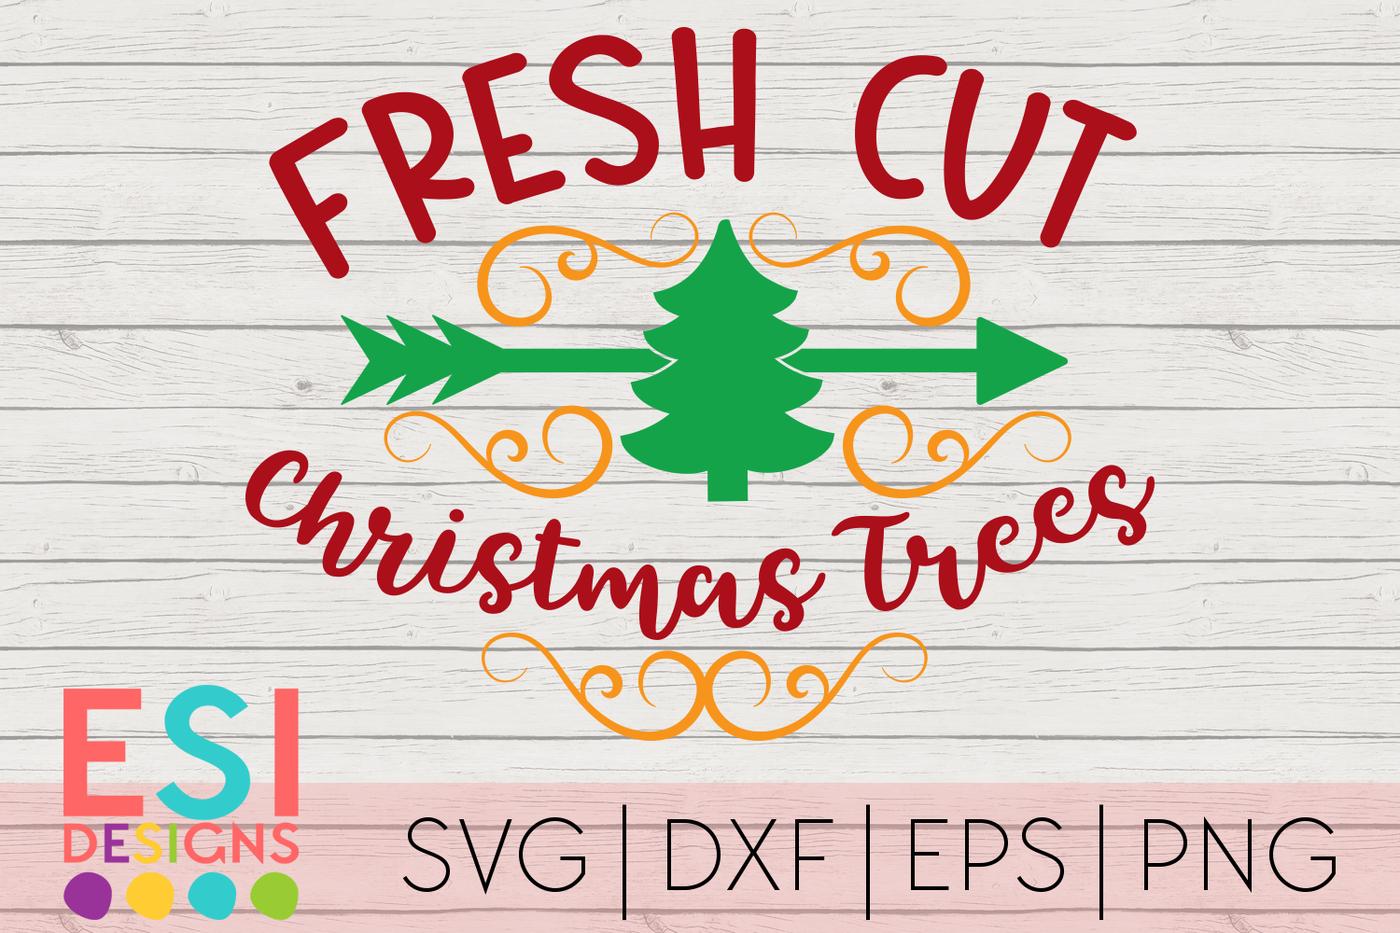 Premier Designs Fresh Edit: Fresh Cut Christmas Trees